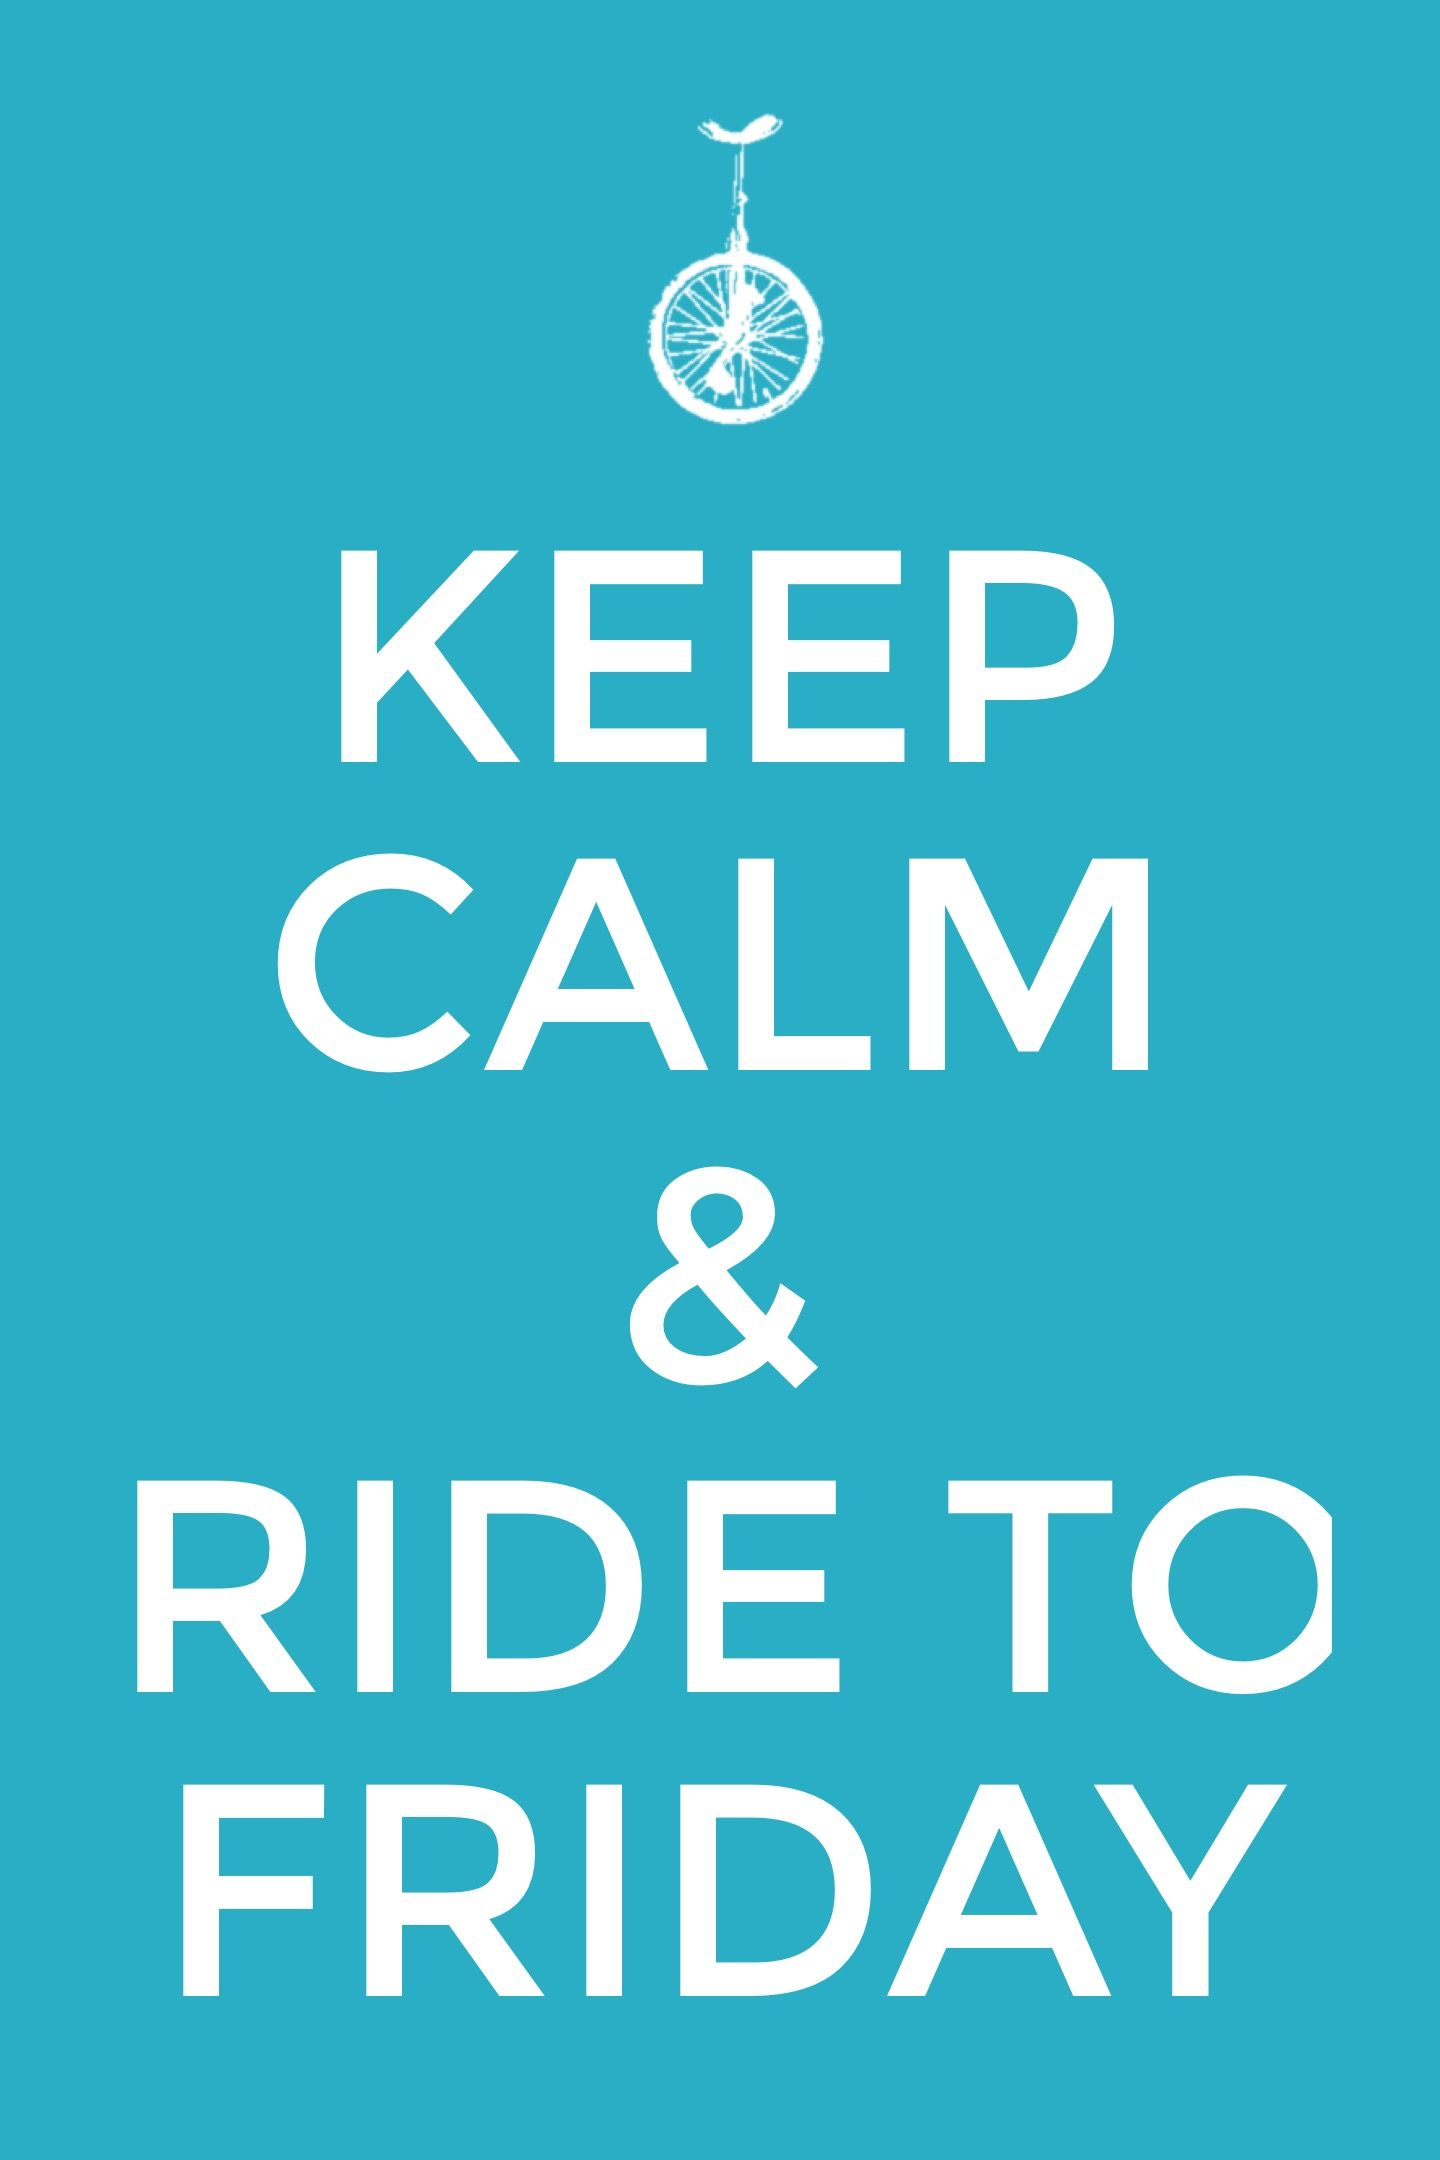 #KeepCalm #RideToFriday